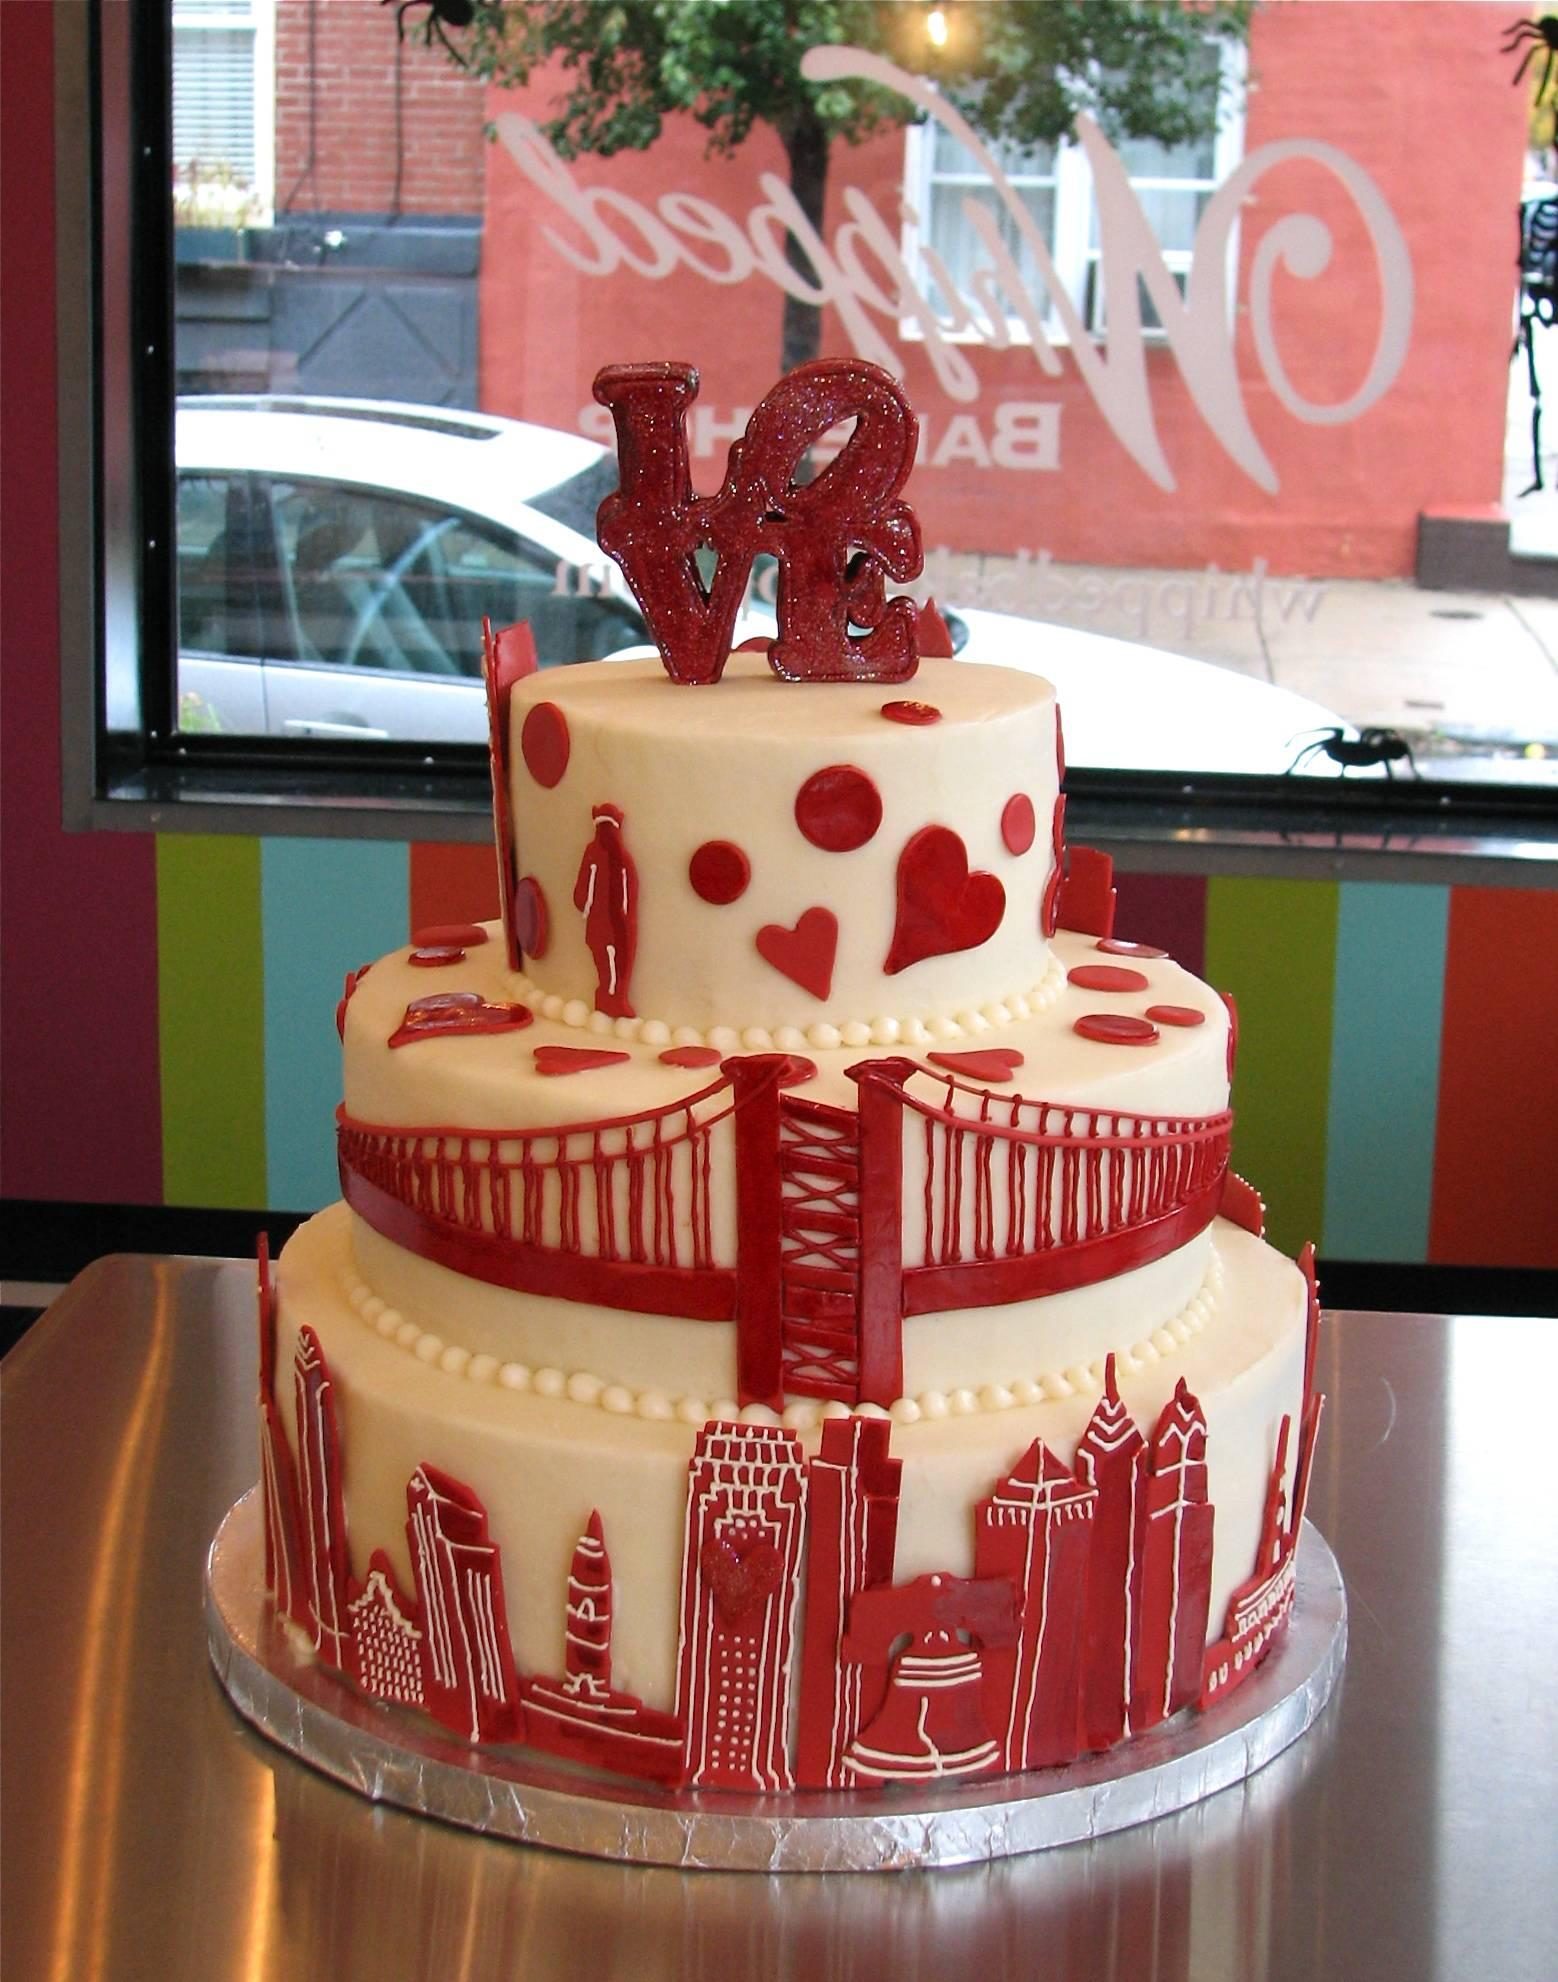 Philly Skyline Birthday Cake